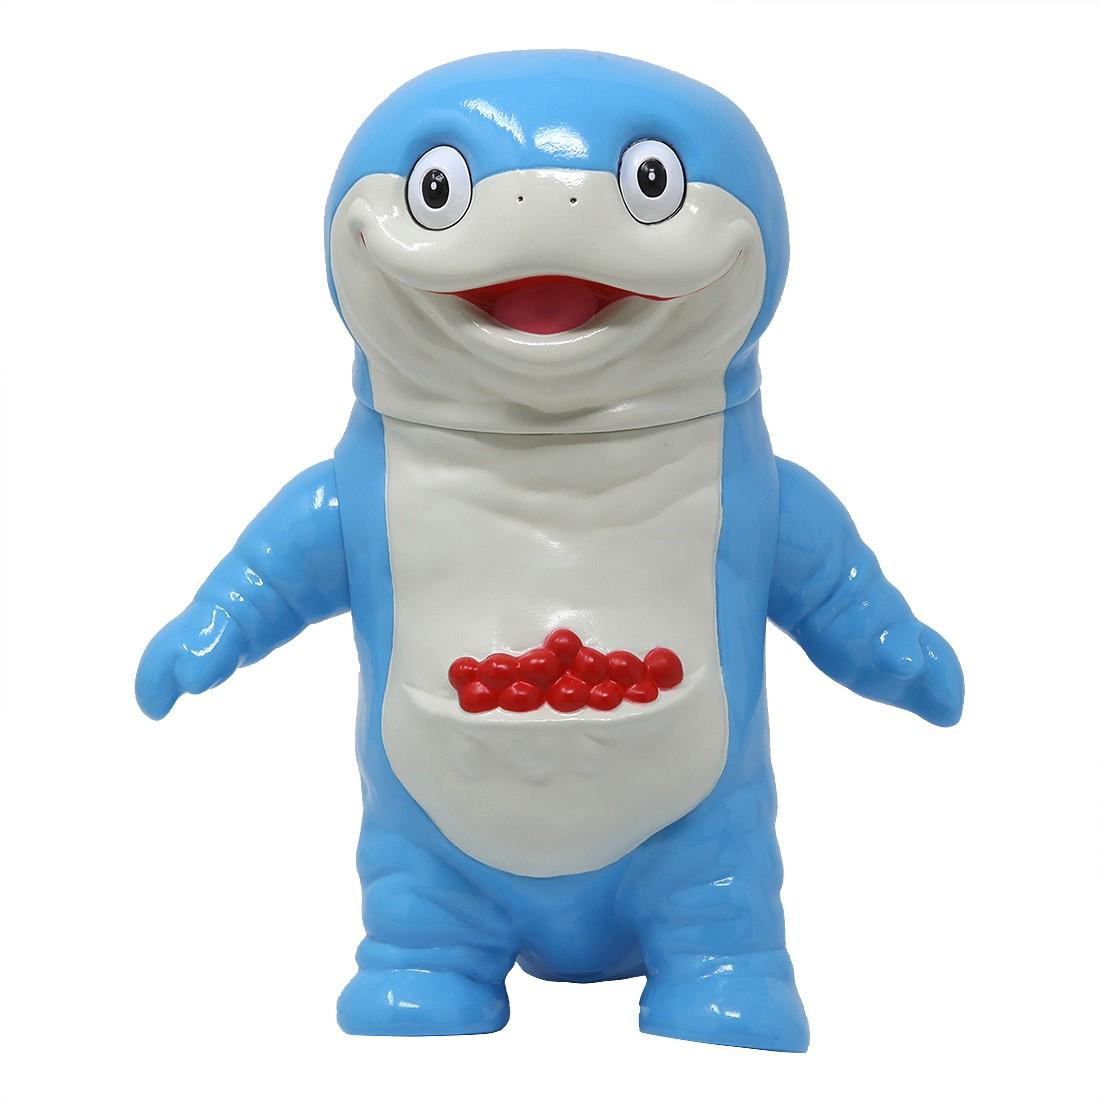 Medicom Coiss The Carp Monster Sofubi Figure (blue)